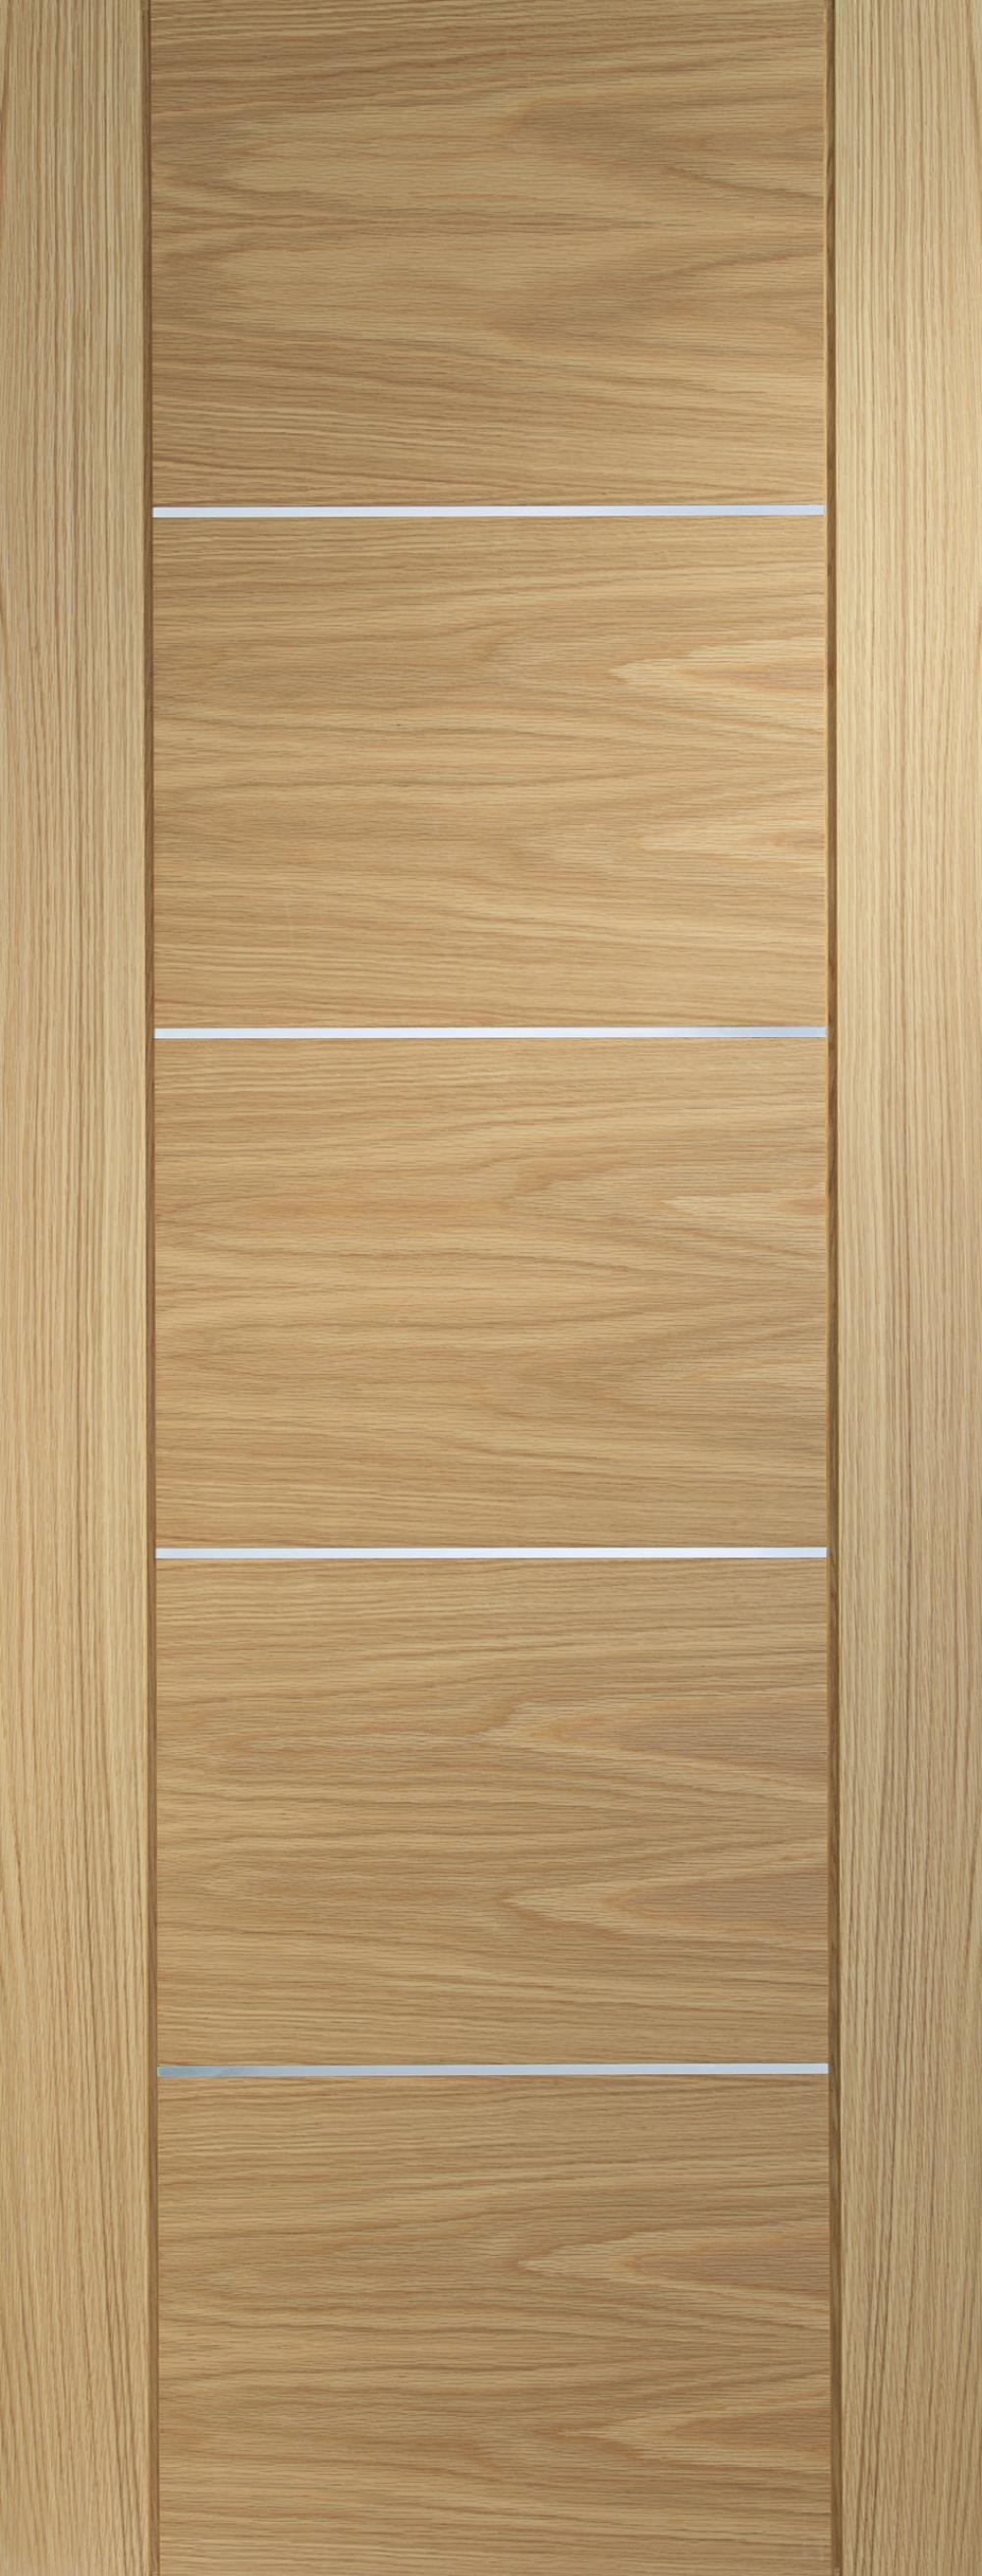 Portici Oak  Door - PREFINISHED